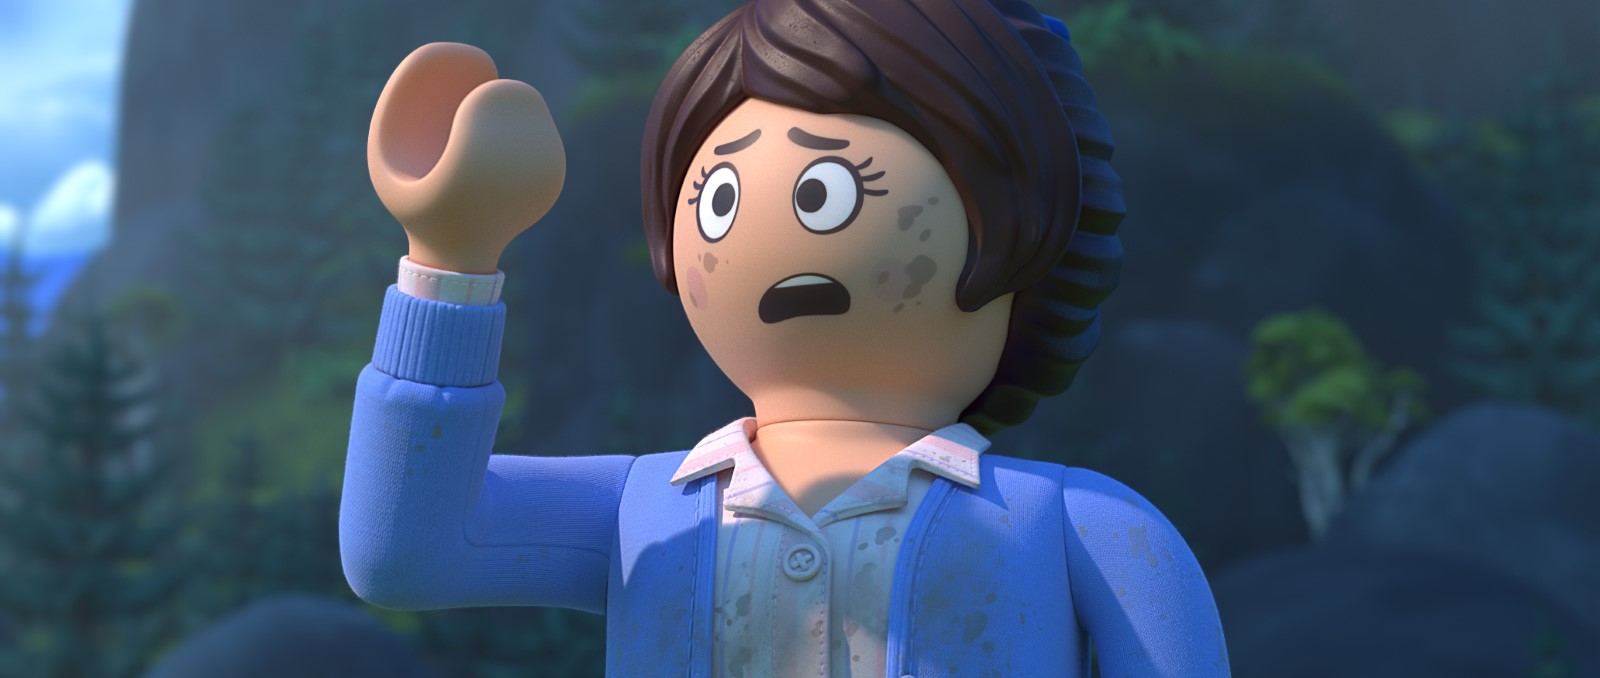 Playmobil – Der Film